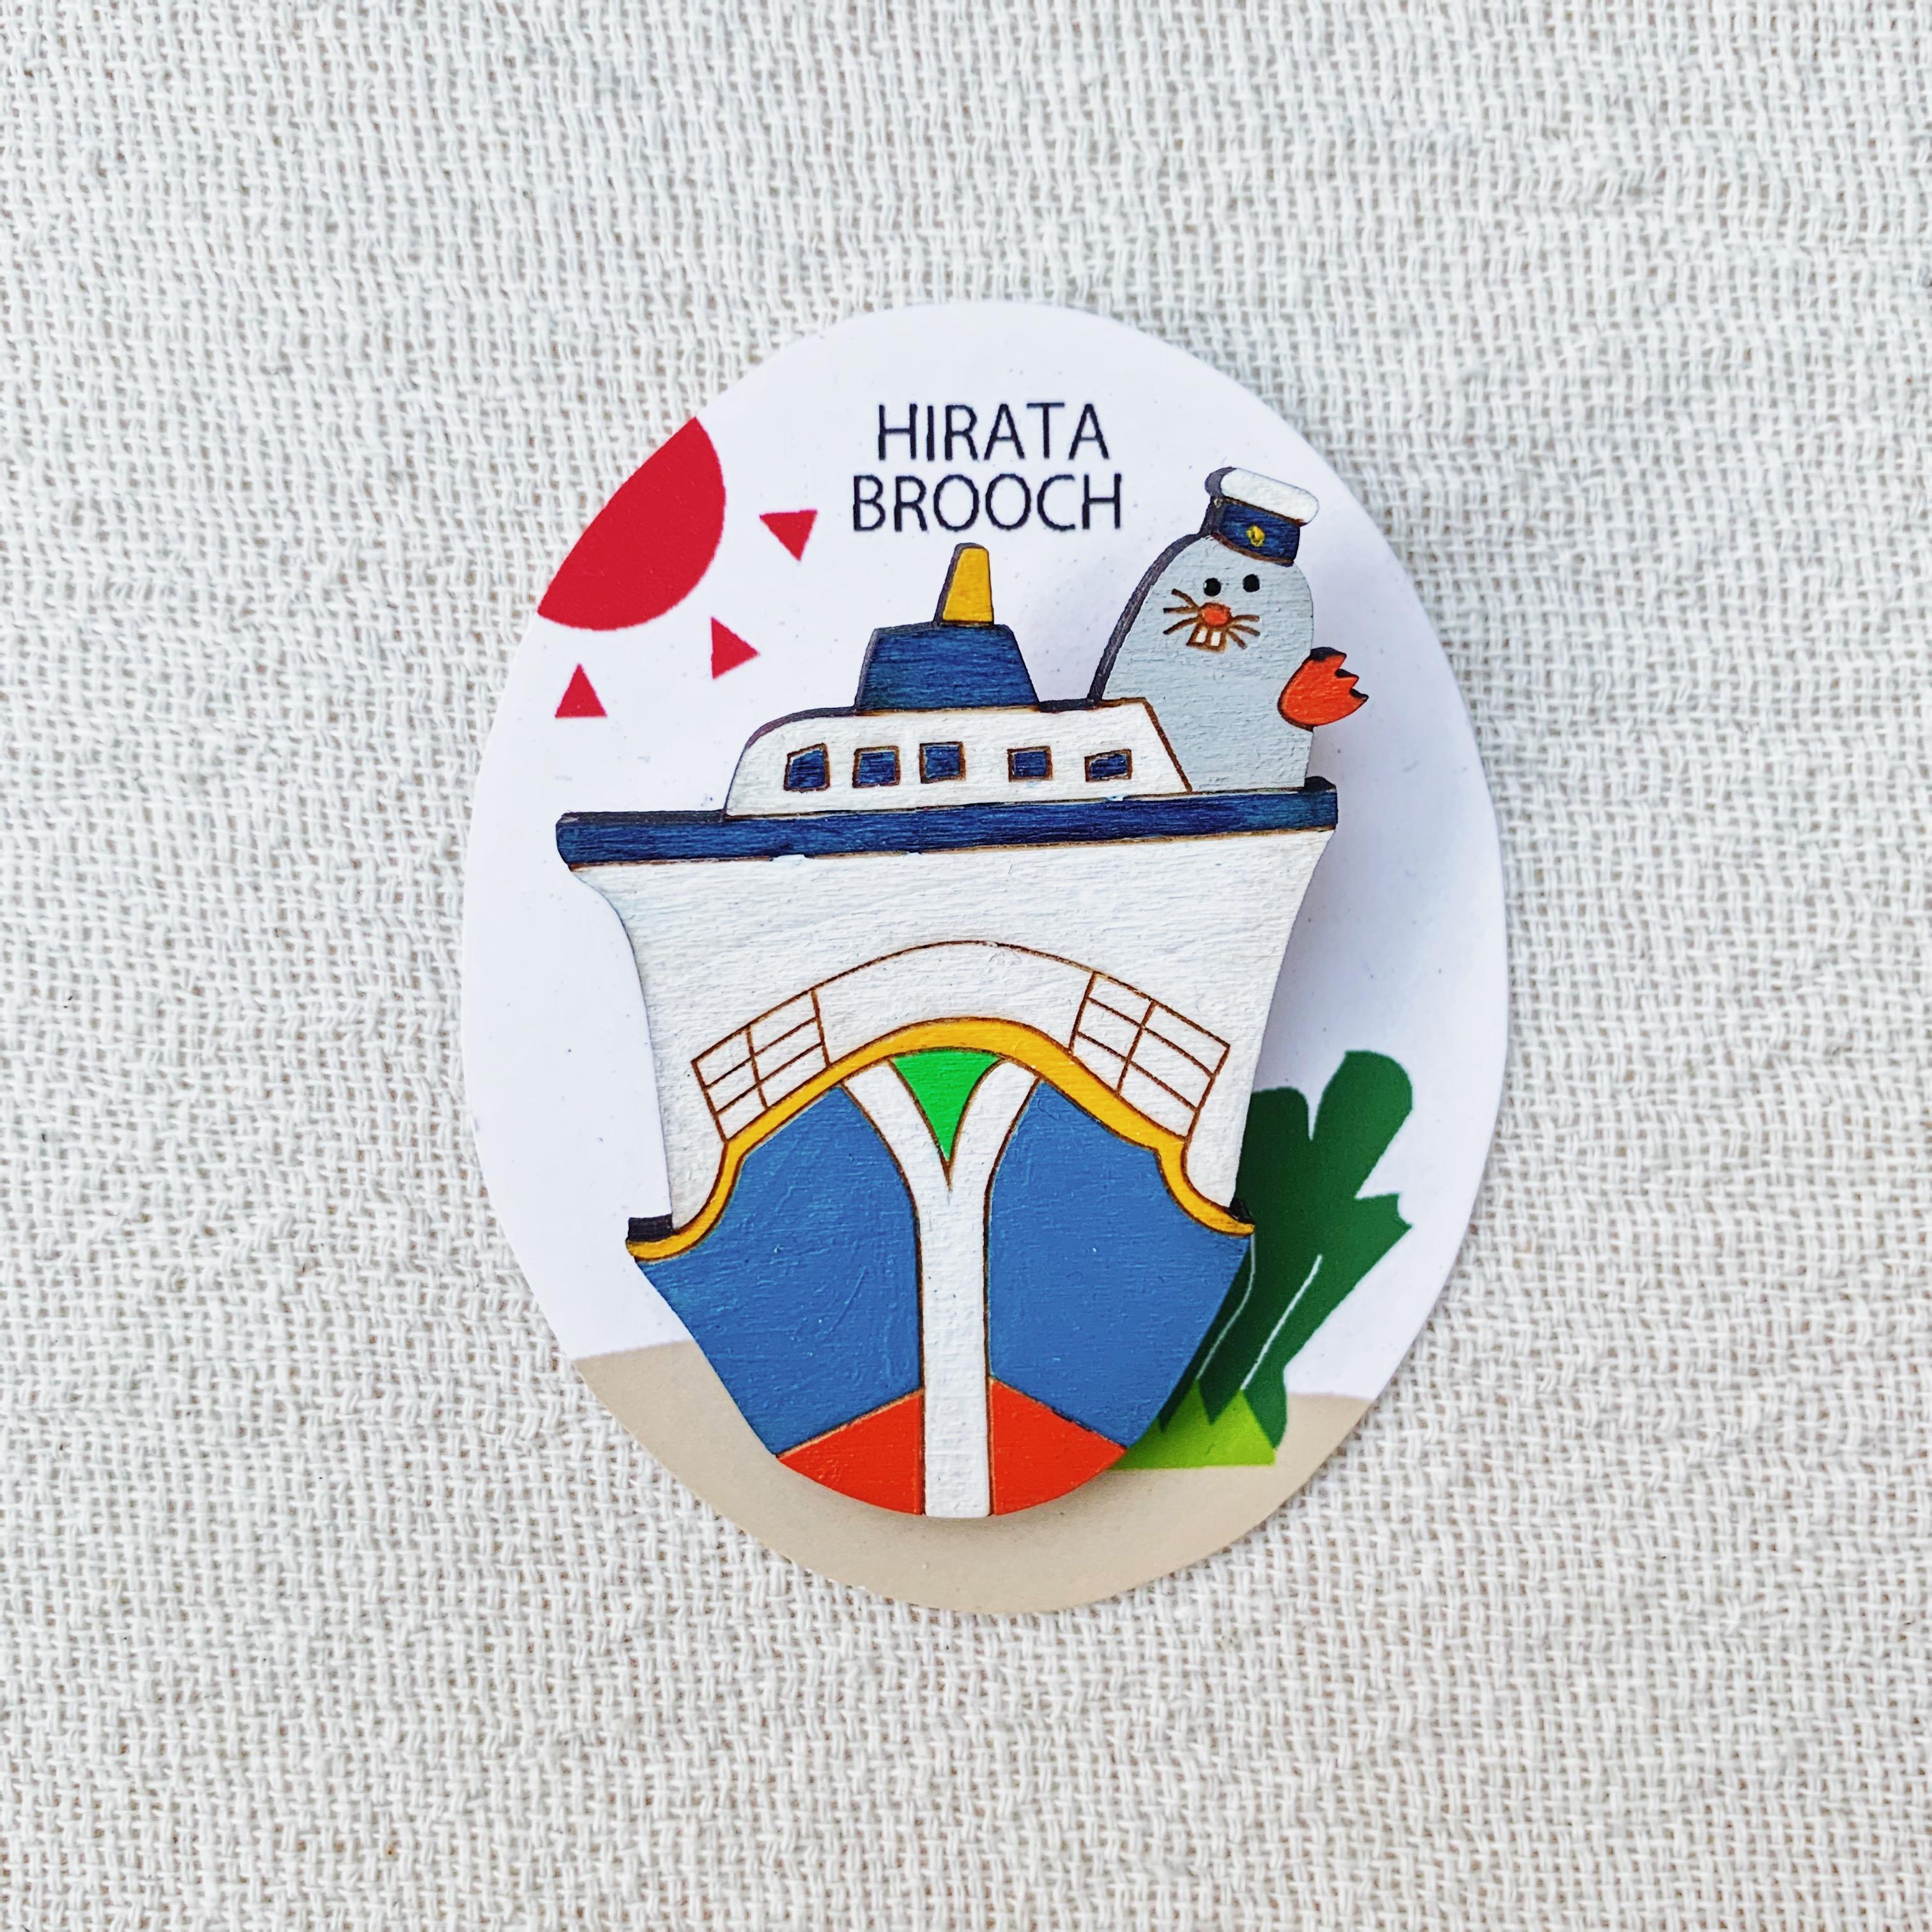 HIRATA BROOCH 2300